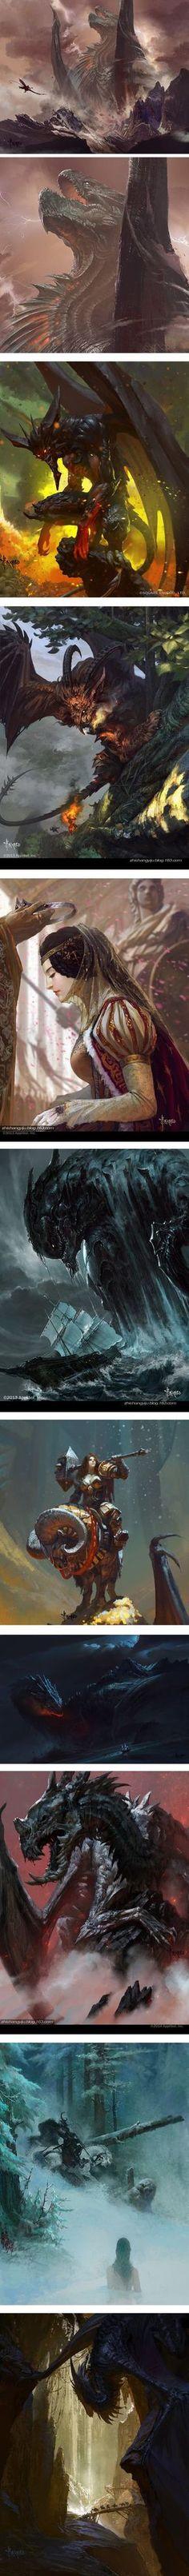 Bayard Wu, concept art, dragons